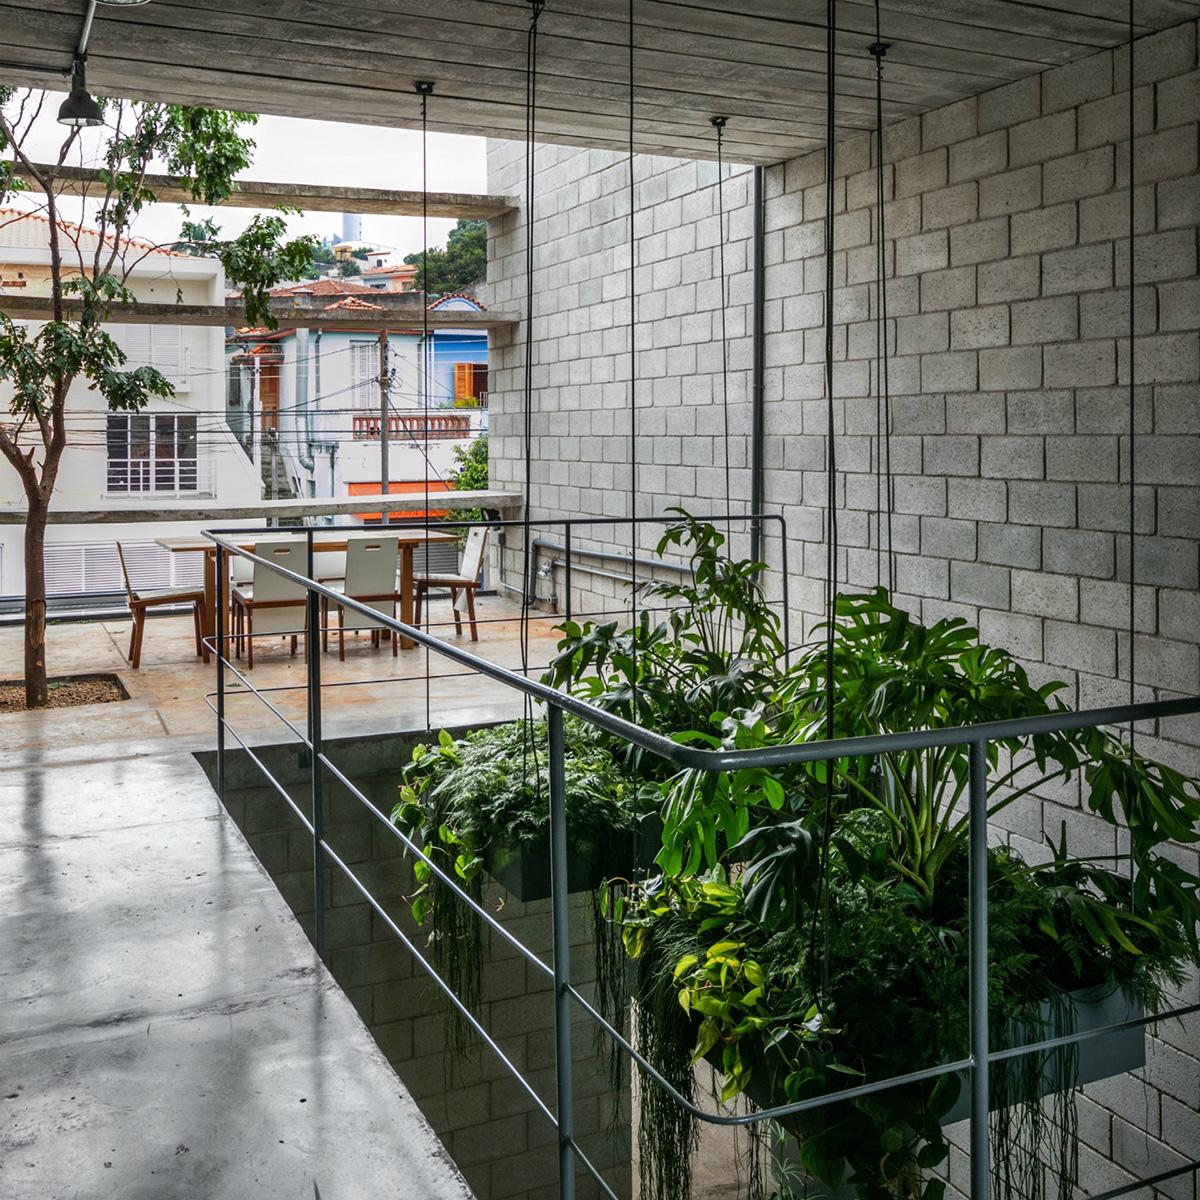 06-casa-mipibu-terra-e-tuma-arquitetos-foto-nelson-kon